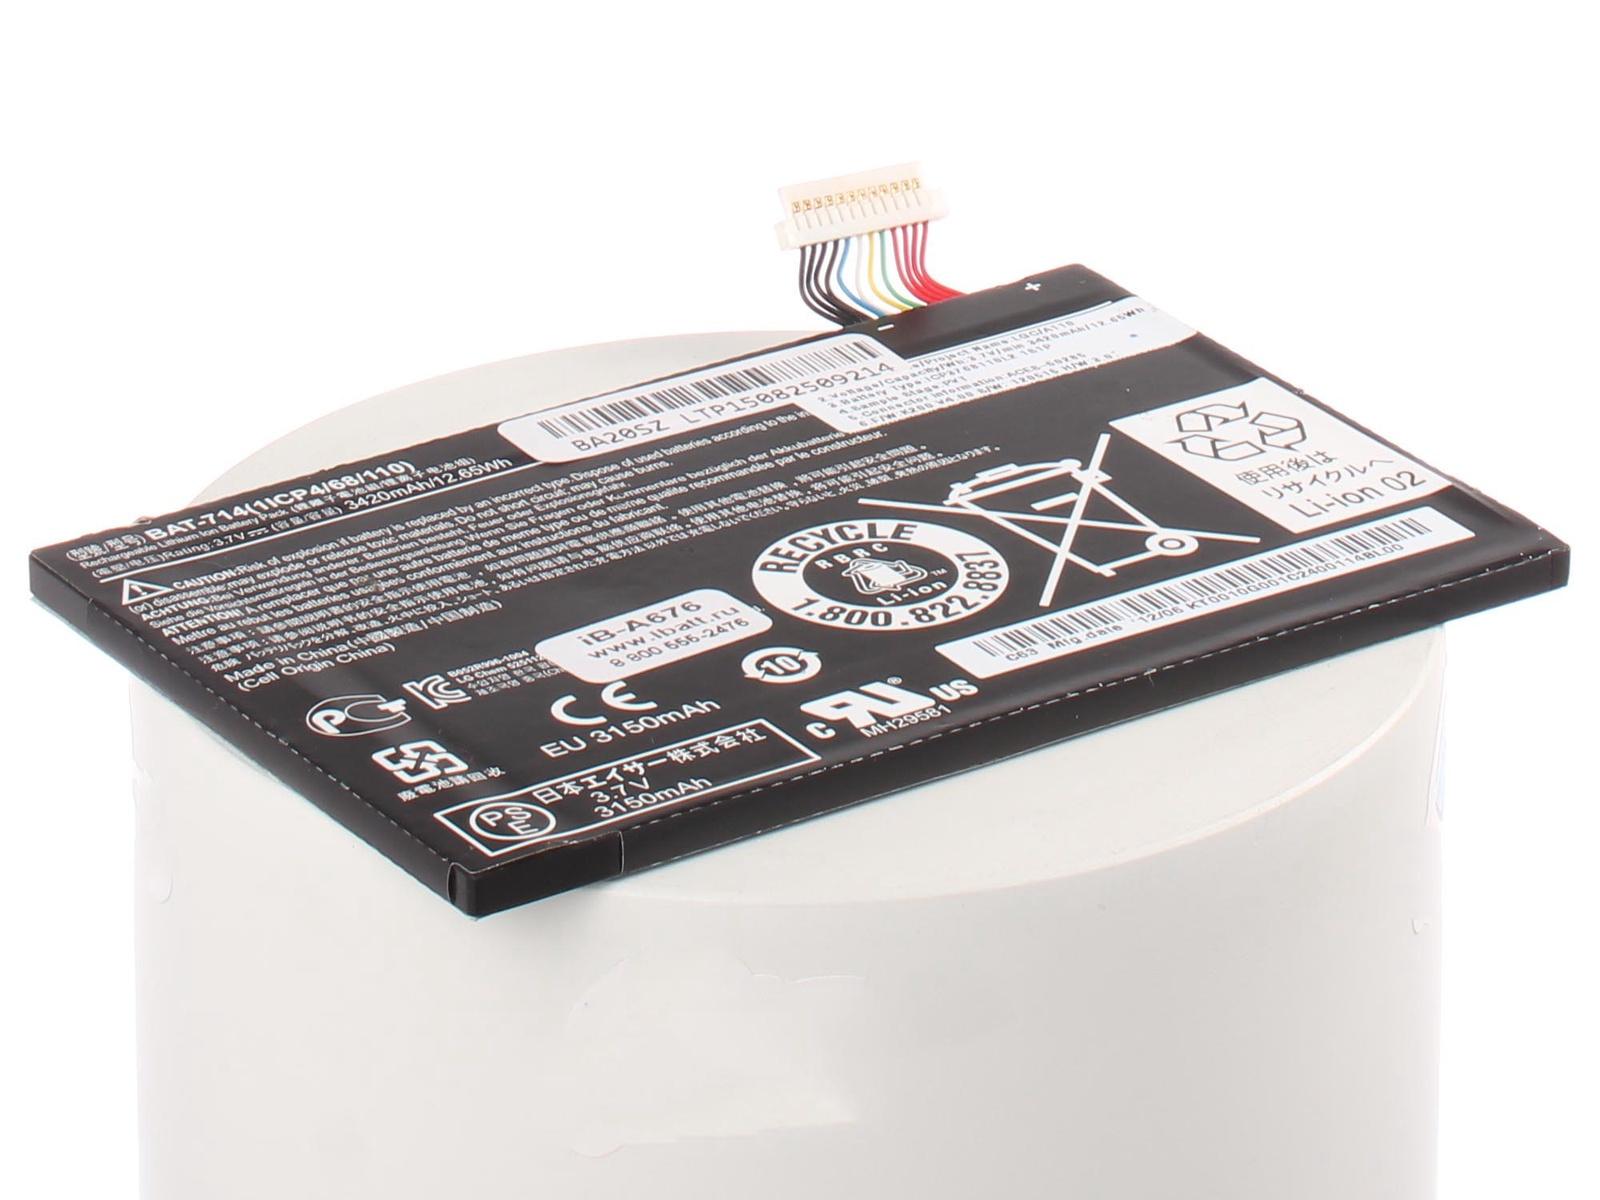 Аккумуляторная батарея iBatt iB-A1-A676 3420mAh для ноутбуков Acer база ноутбуков